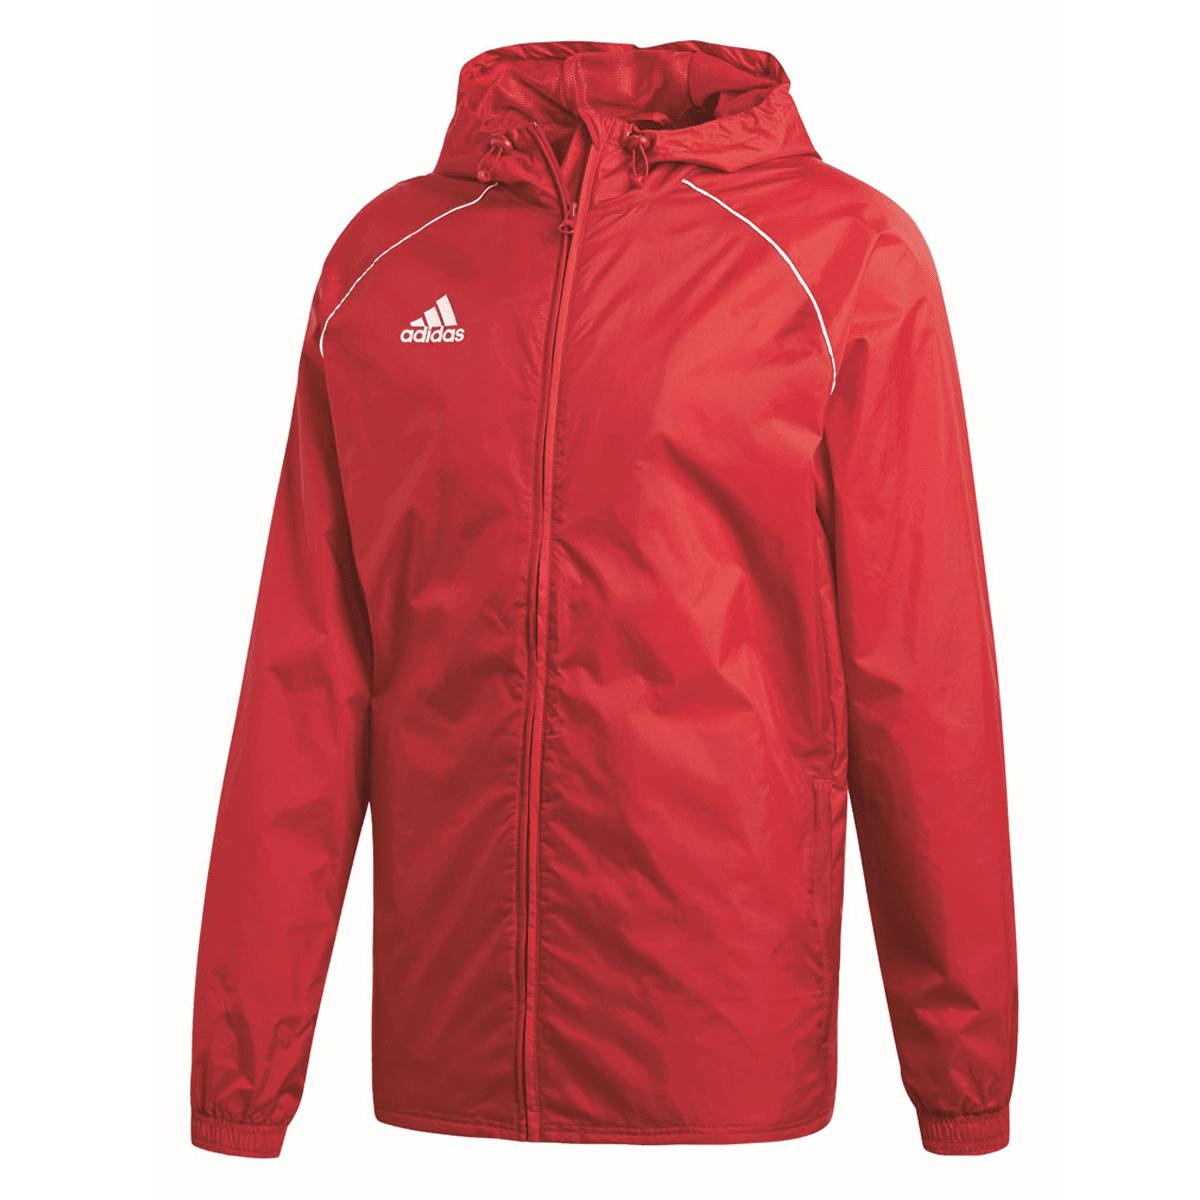 fcf36155303 Adidas regenjas Core 18 rood/wit - Voetbal shop